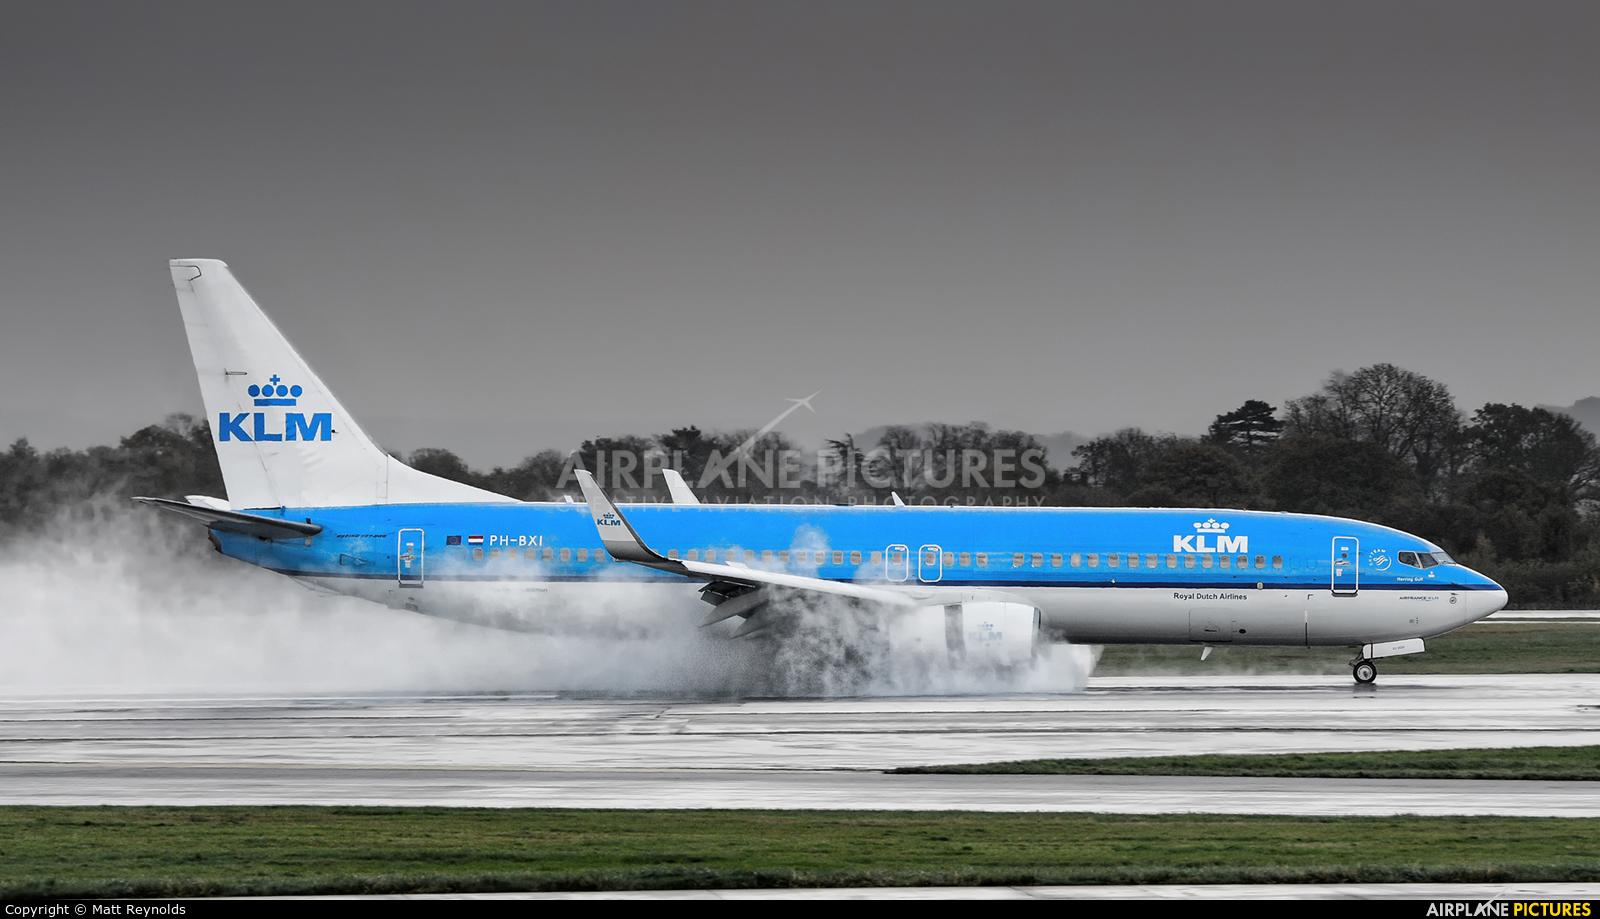 KLM PH-BXI aircraft at Manchester